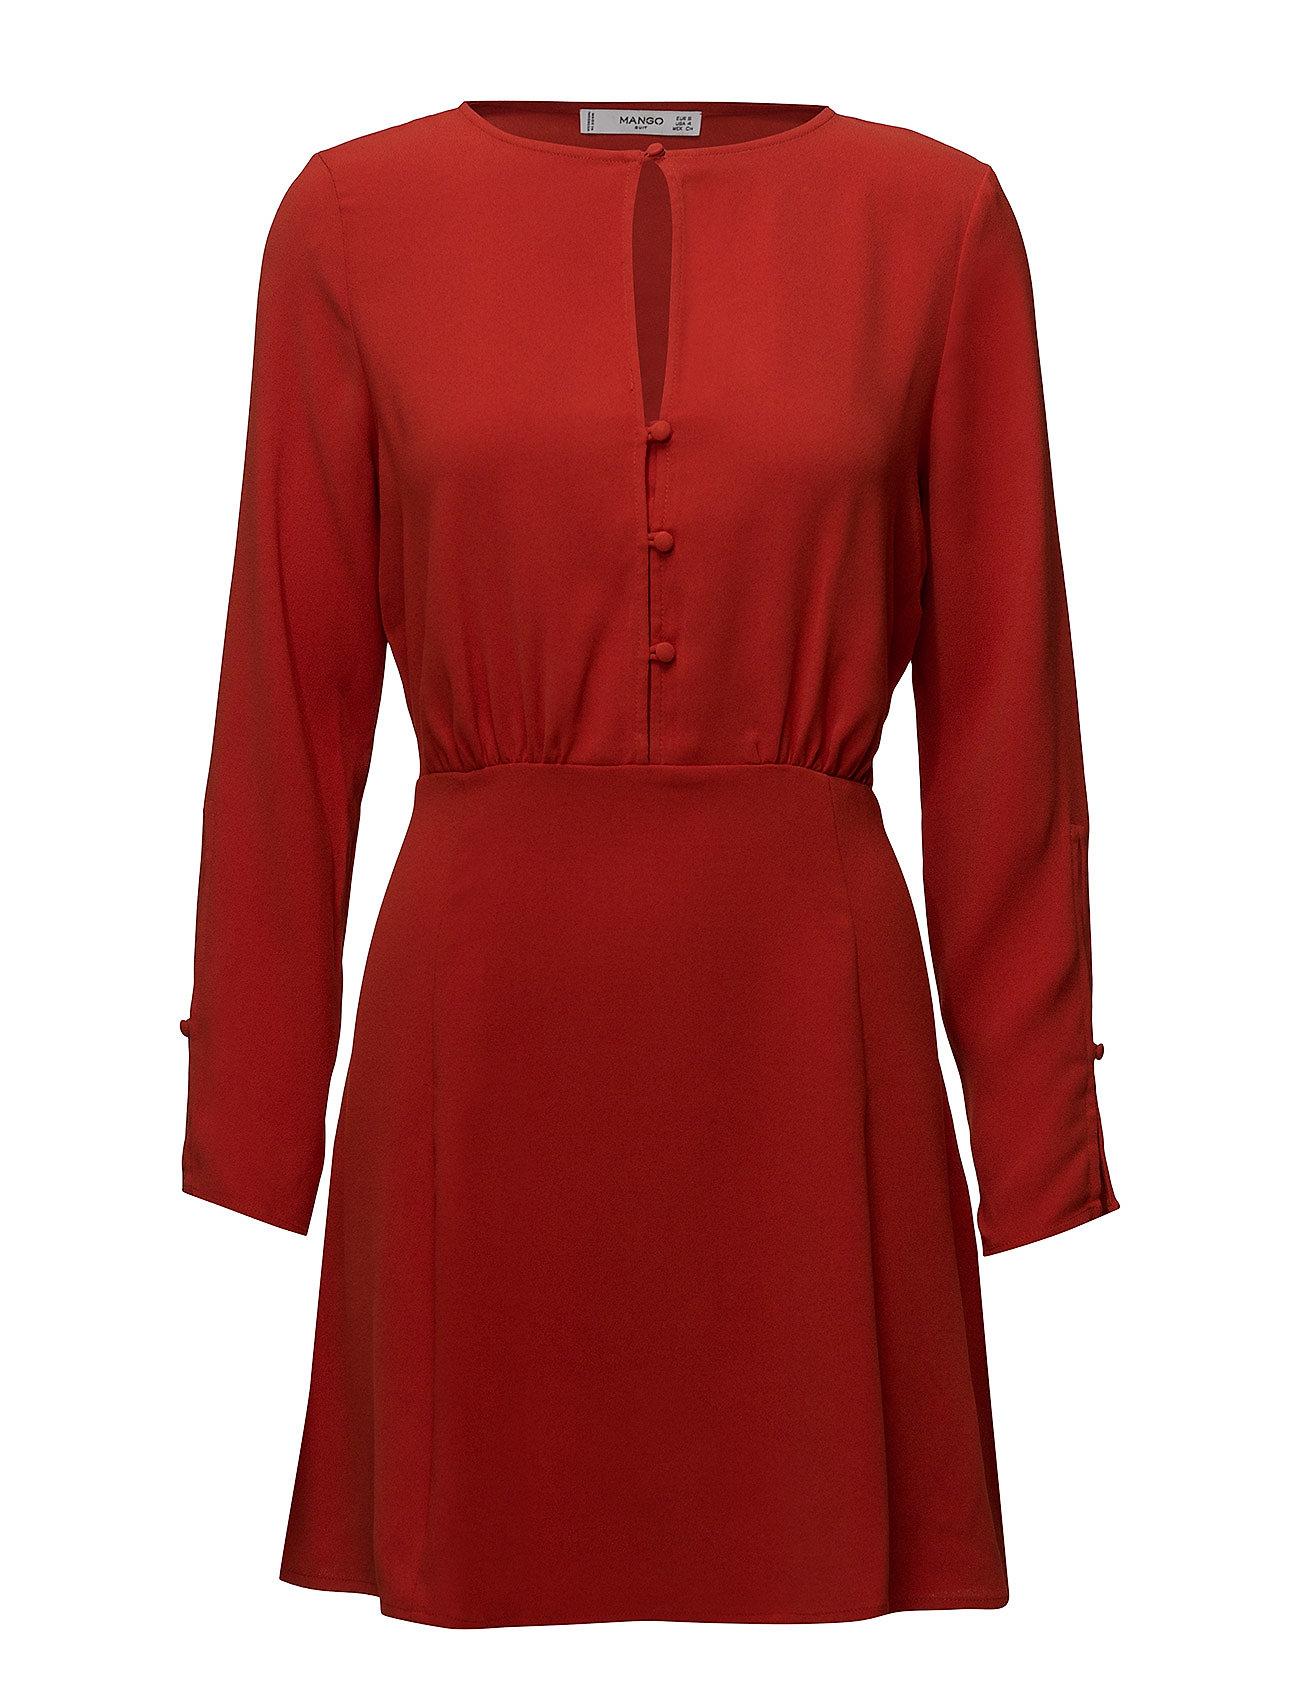 Cut-Out Detail Dress